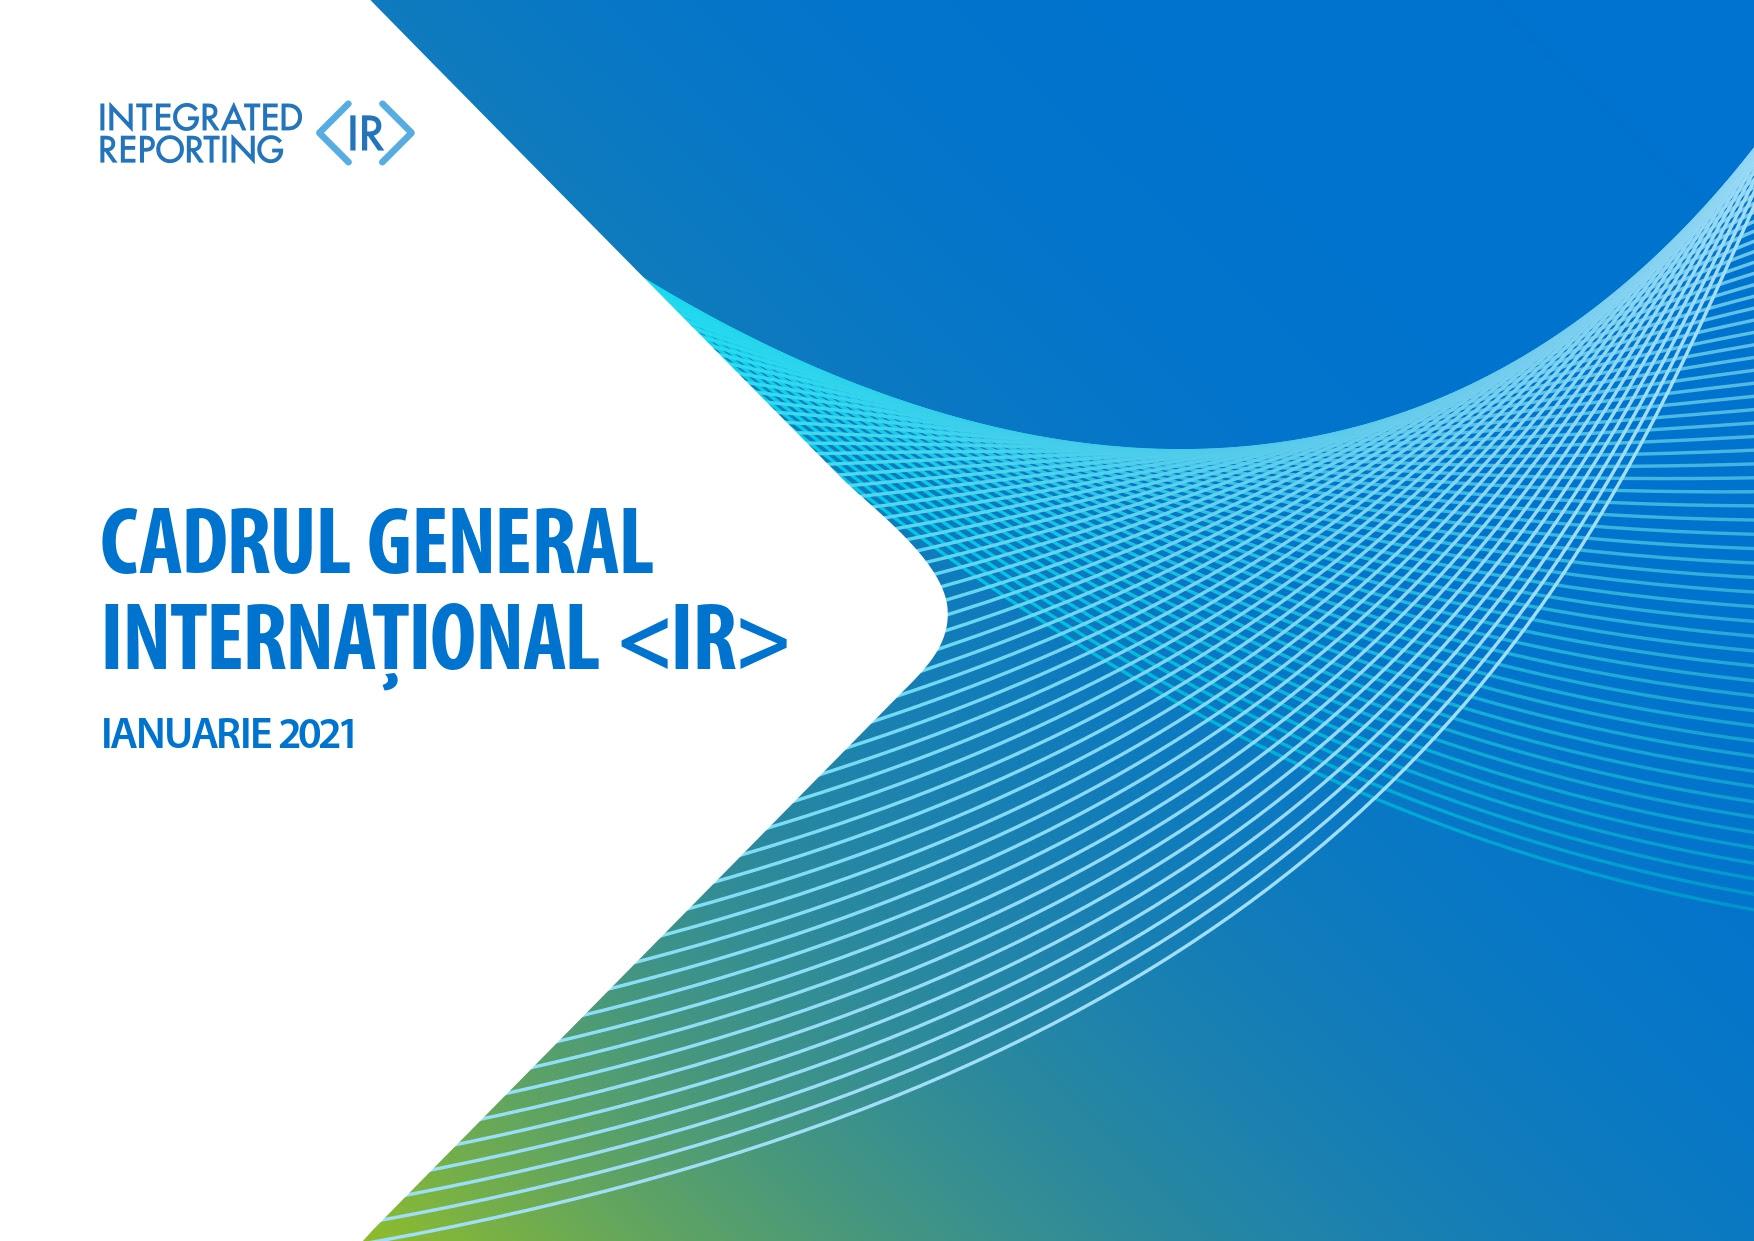 Cadrul_general_international